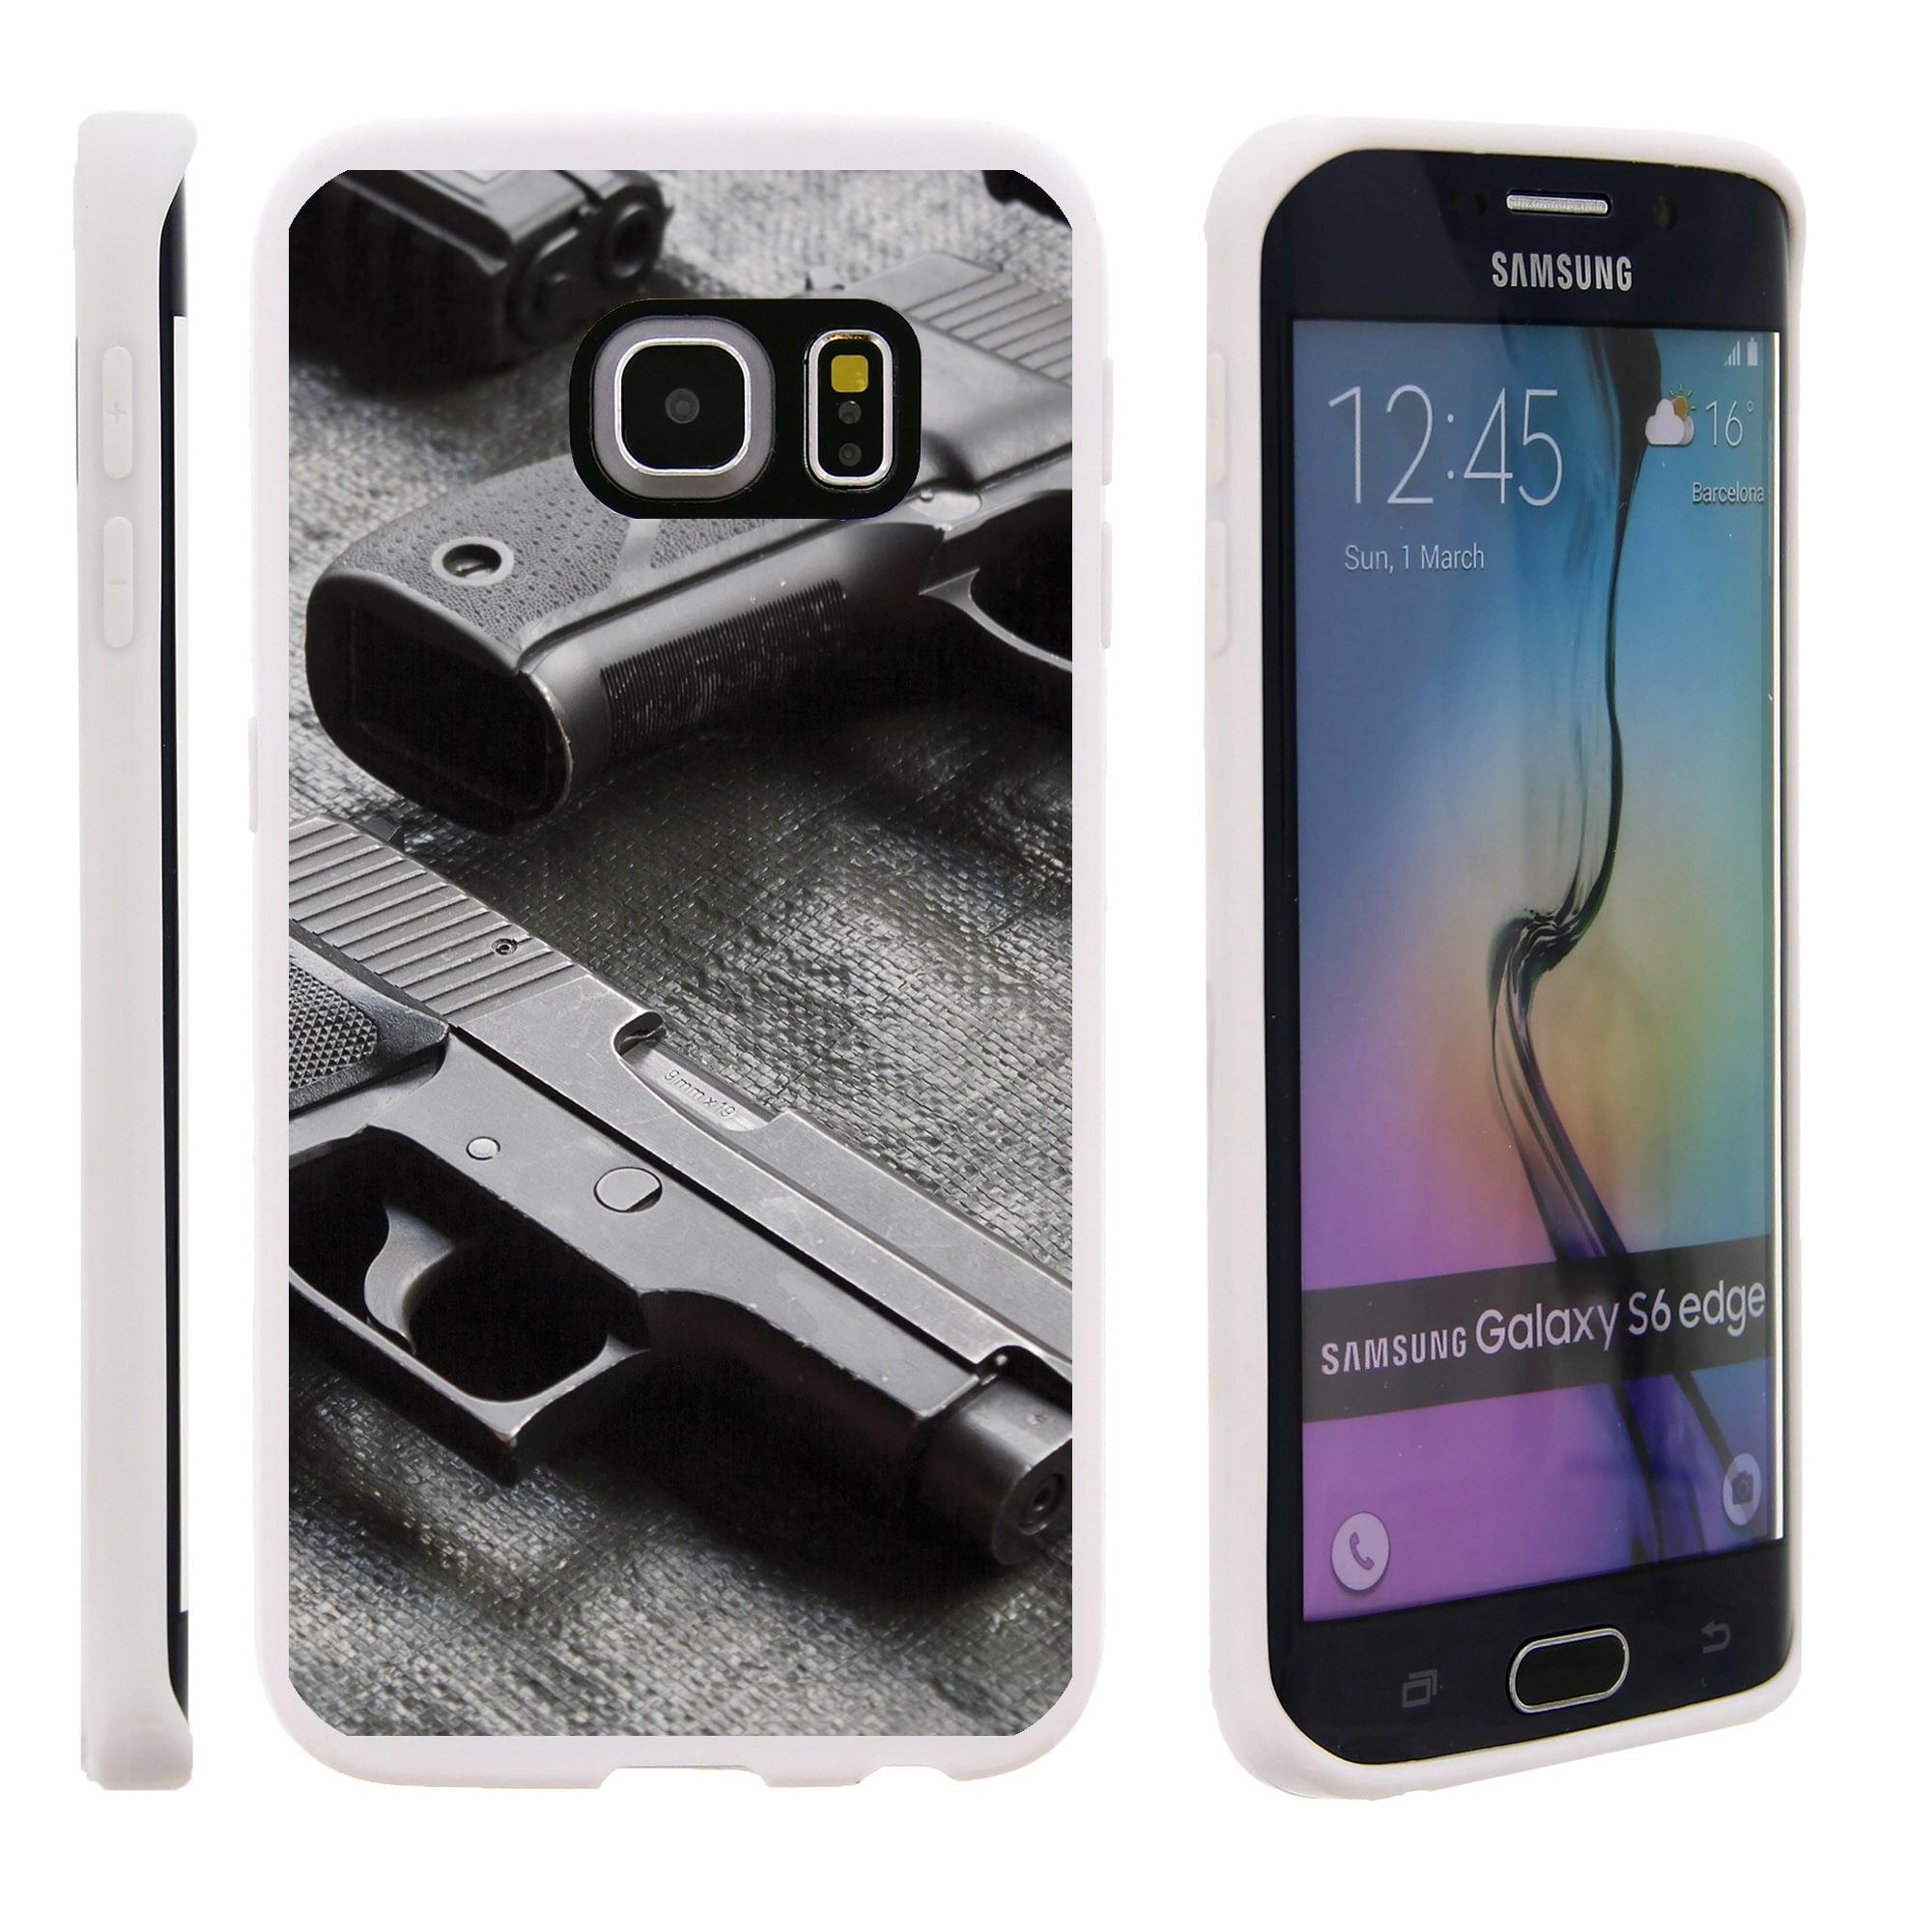 Samsung Galaxy S6 Edge G925, Flexible Case [FLEX FORCE] Slim Durable TPU Sleek Bumper with Unique Designs - Pistol